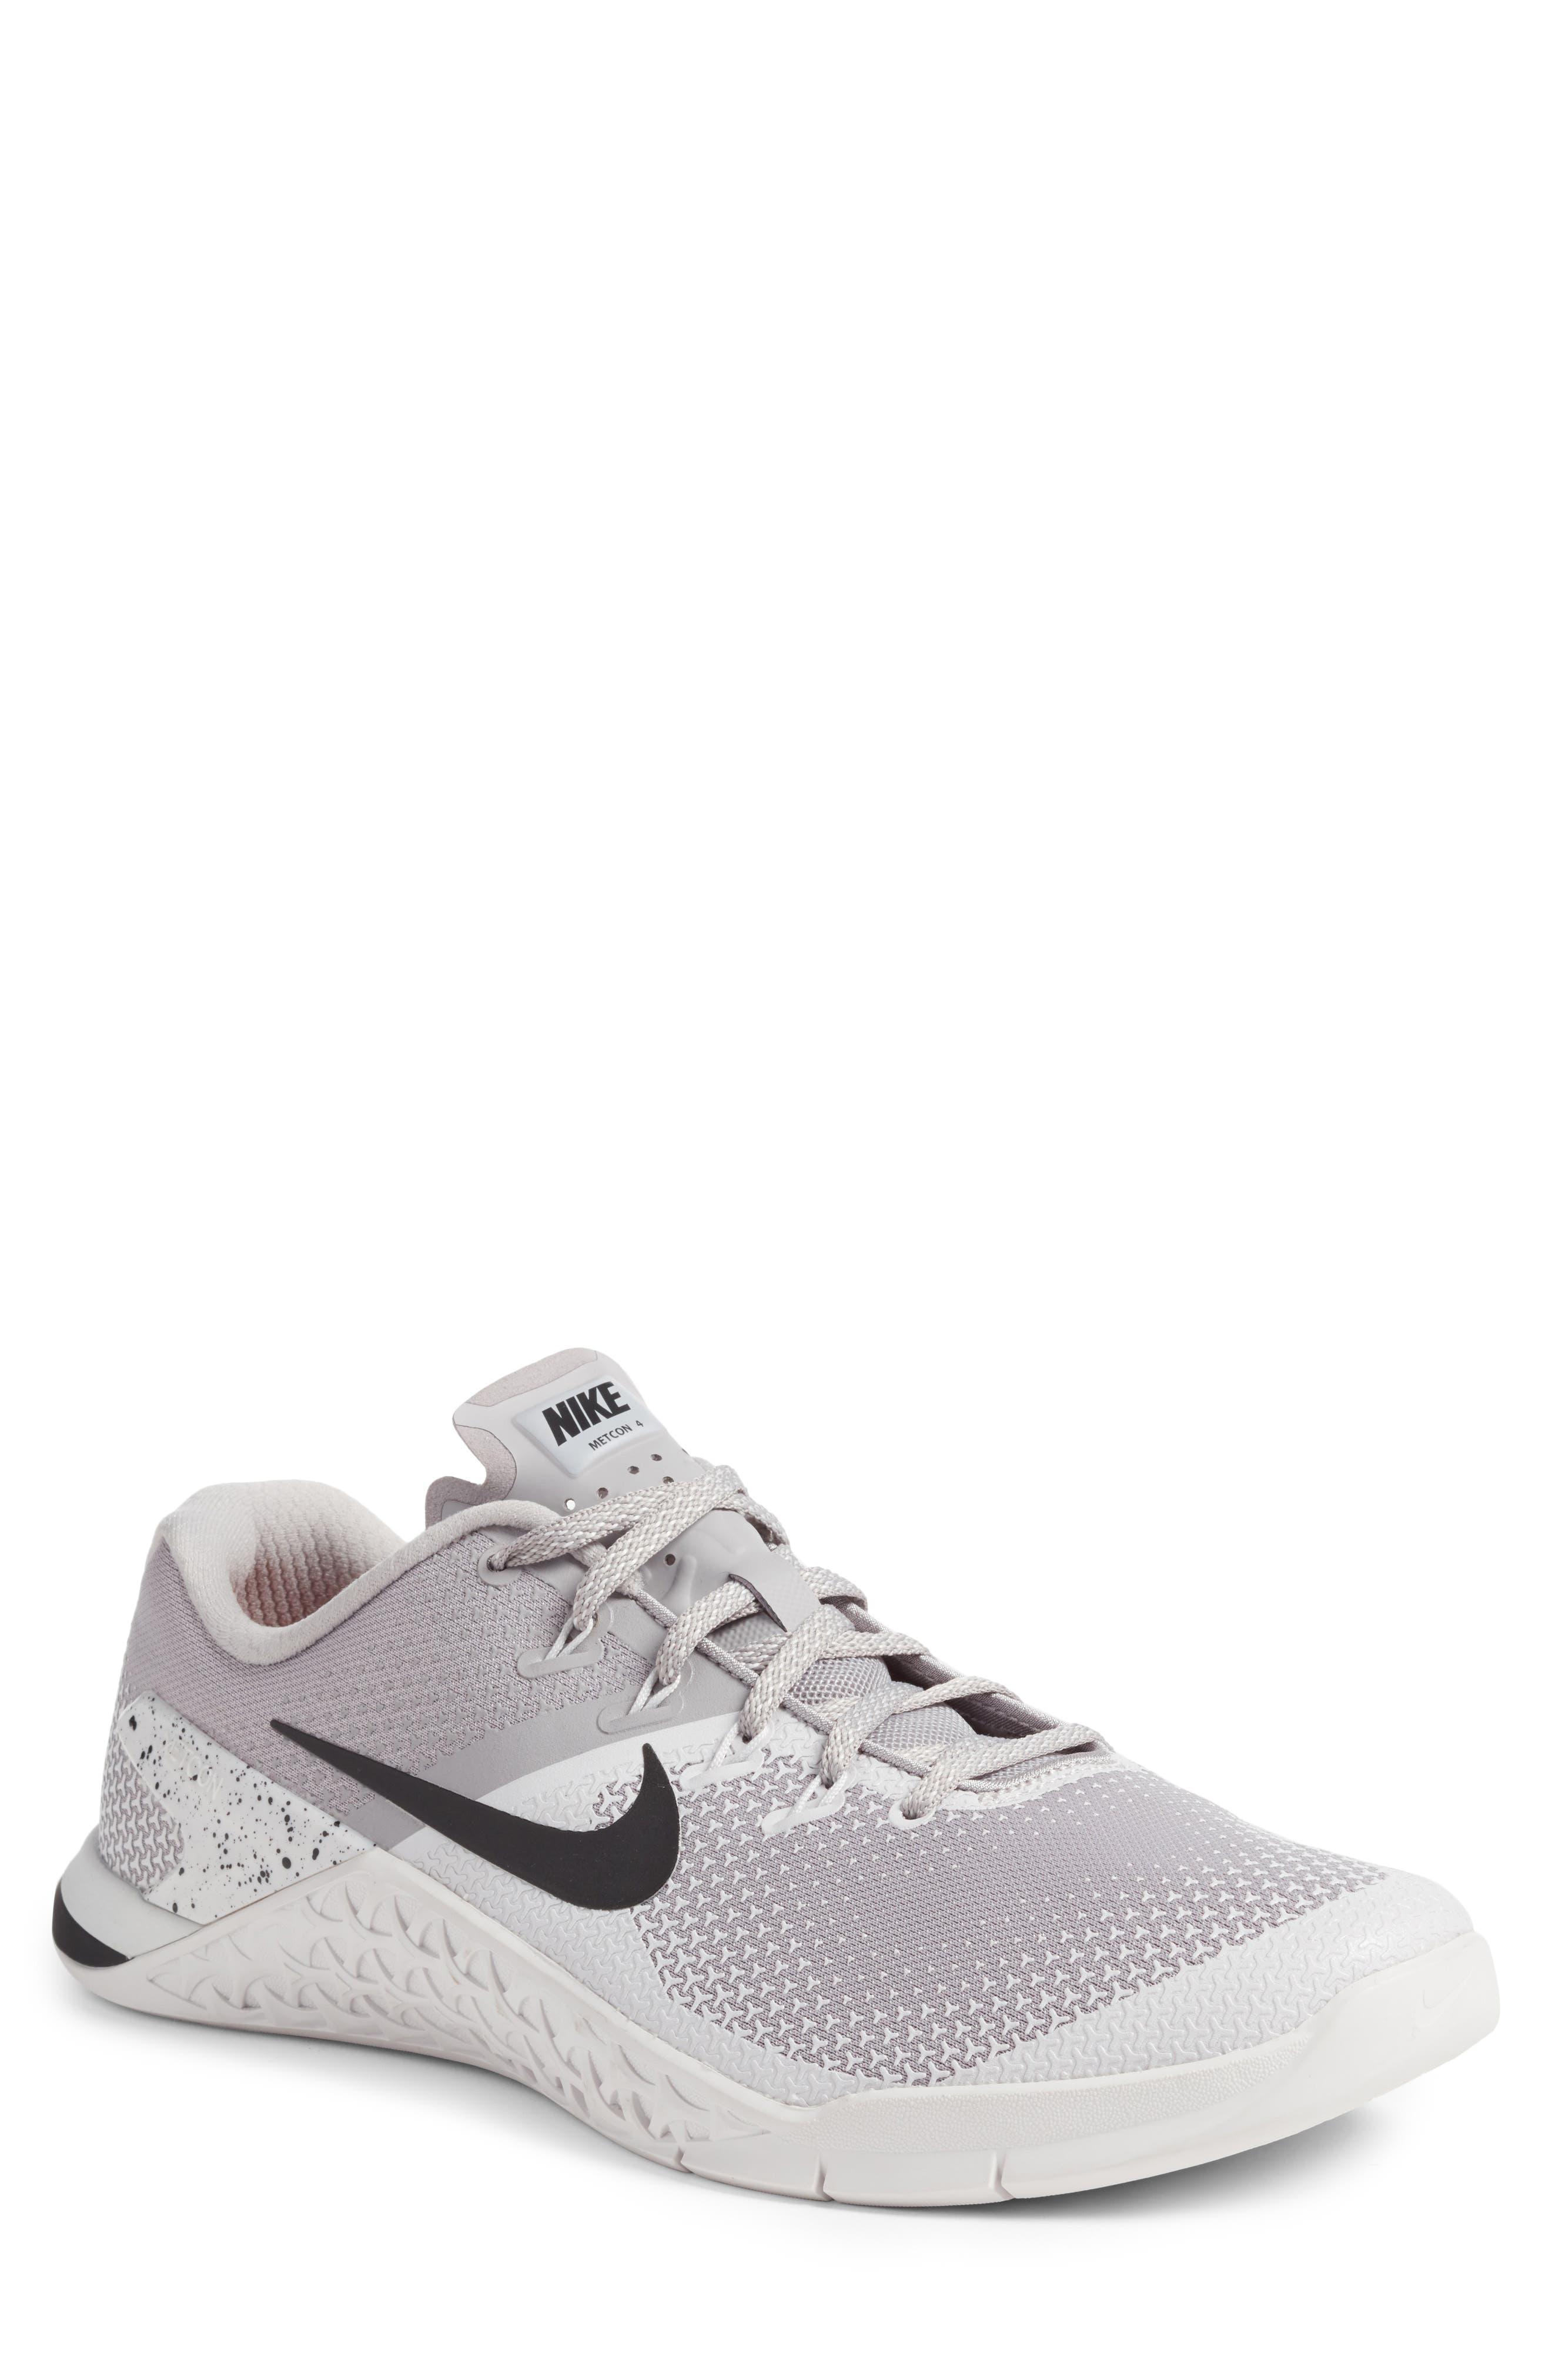 Metcon 4 Training Shoe,                         Main,                         color, ATMOSPHERE GREY/ BLACK